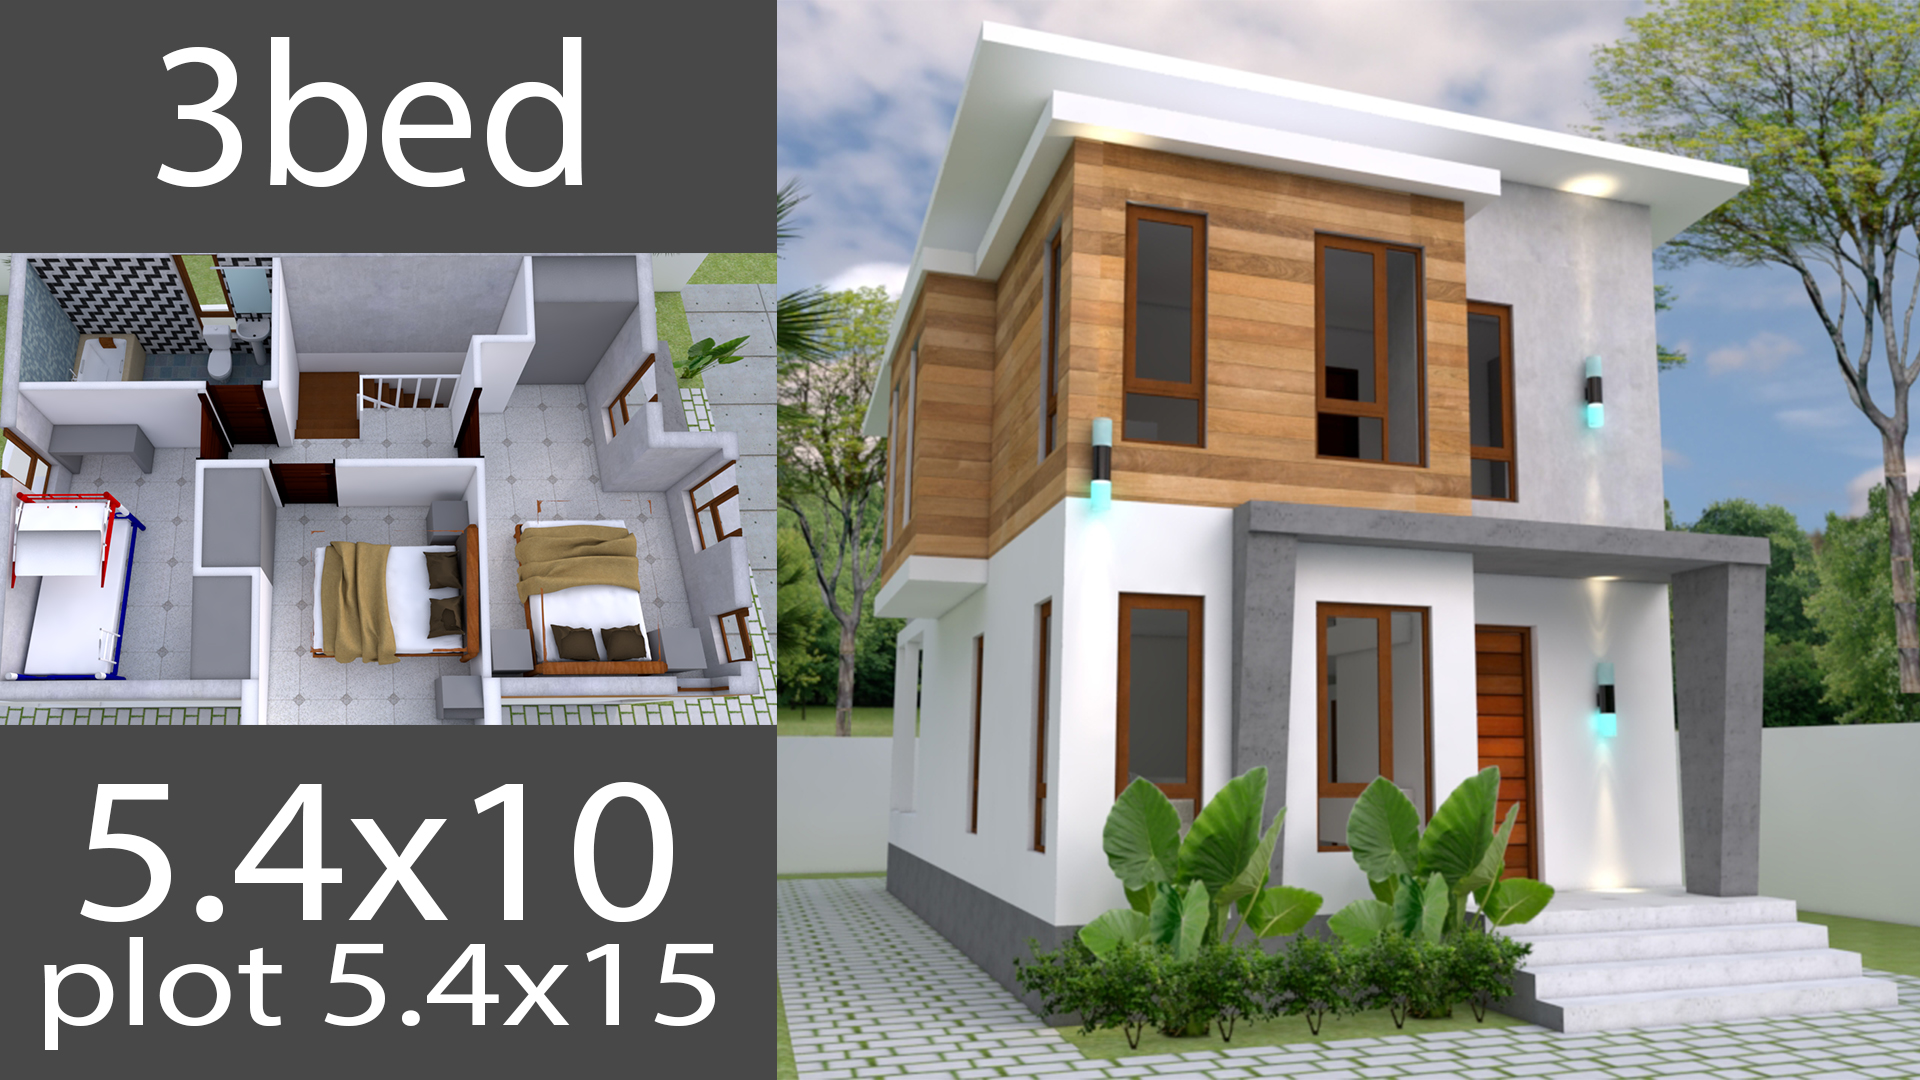 Small Home design Plan 5.4x10m with 3 Bedroom - SamPhoas Plan